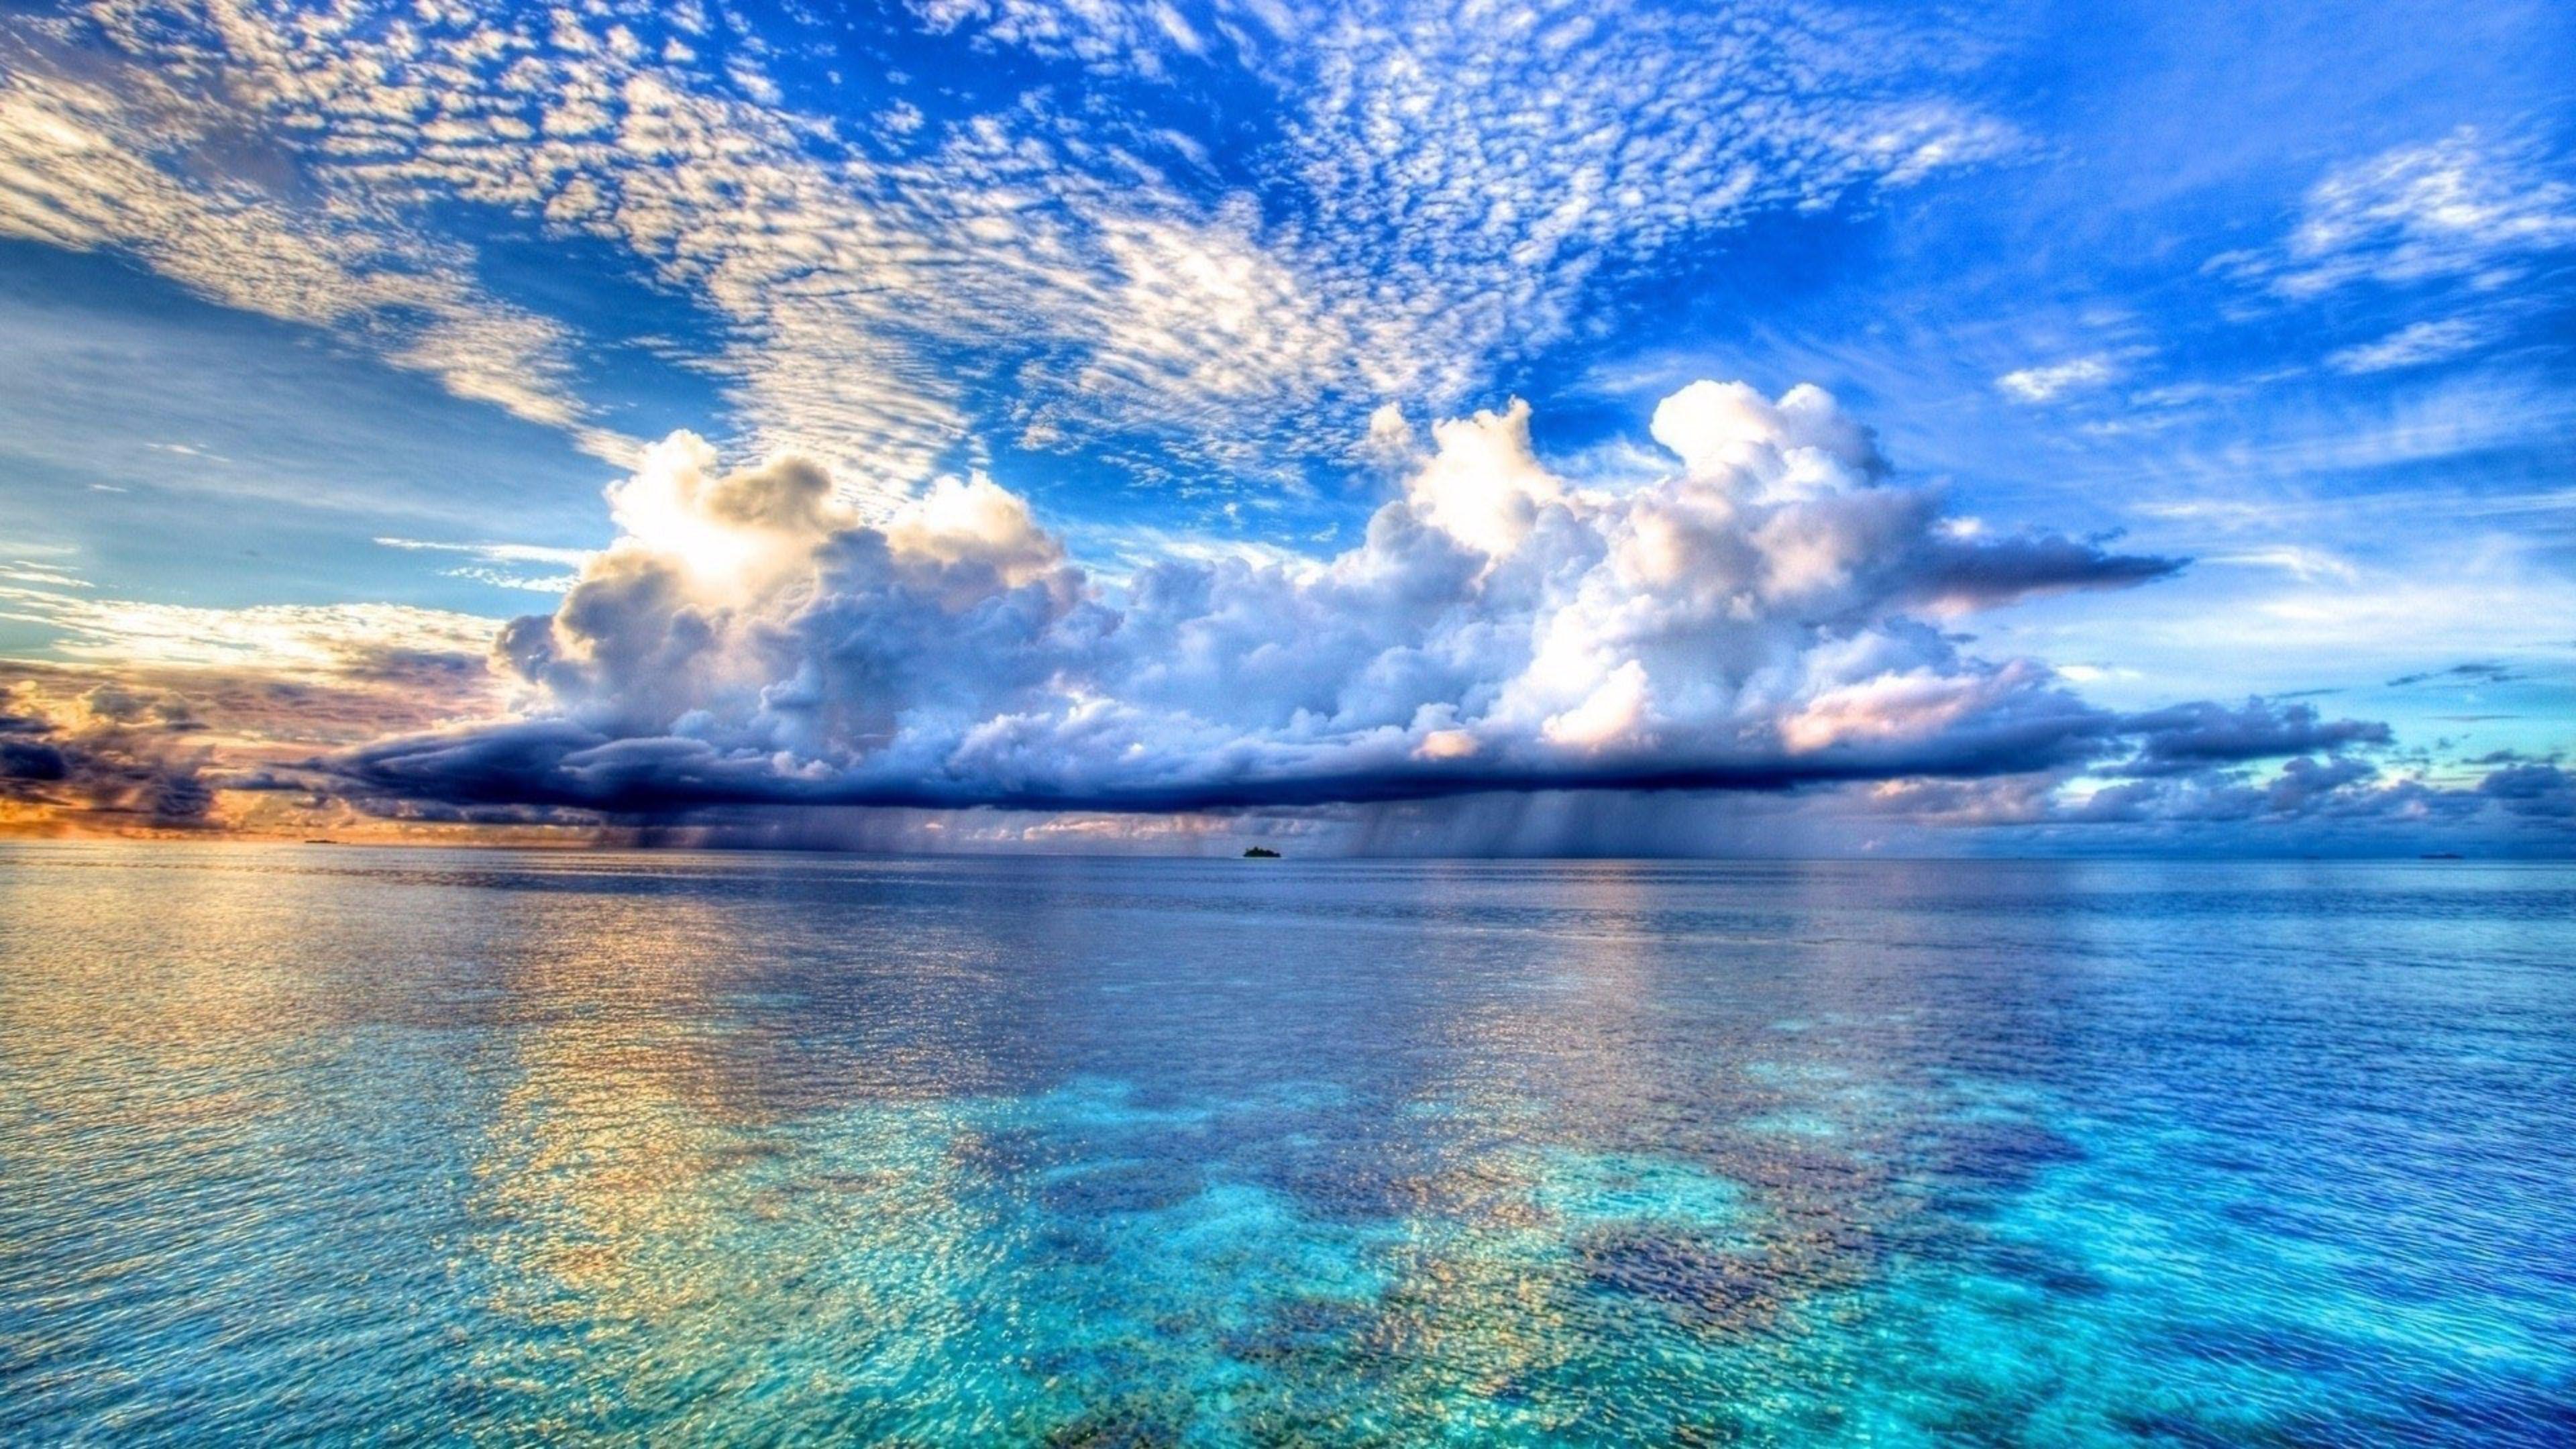 4k最美丽山水风景无水印壁纸下载